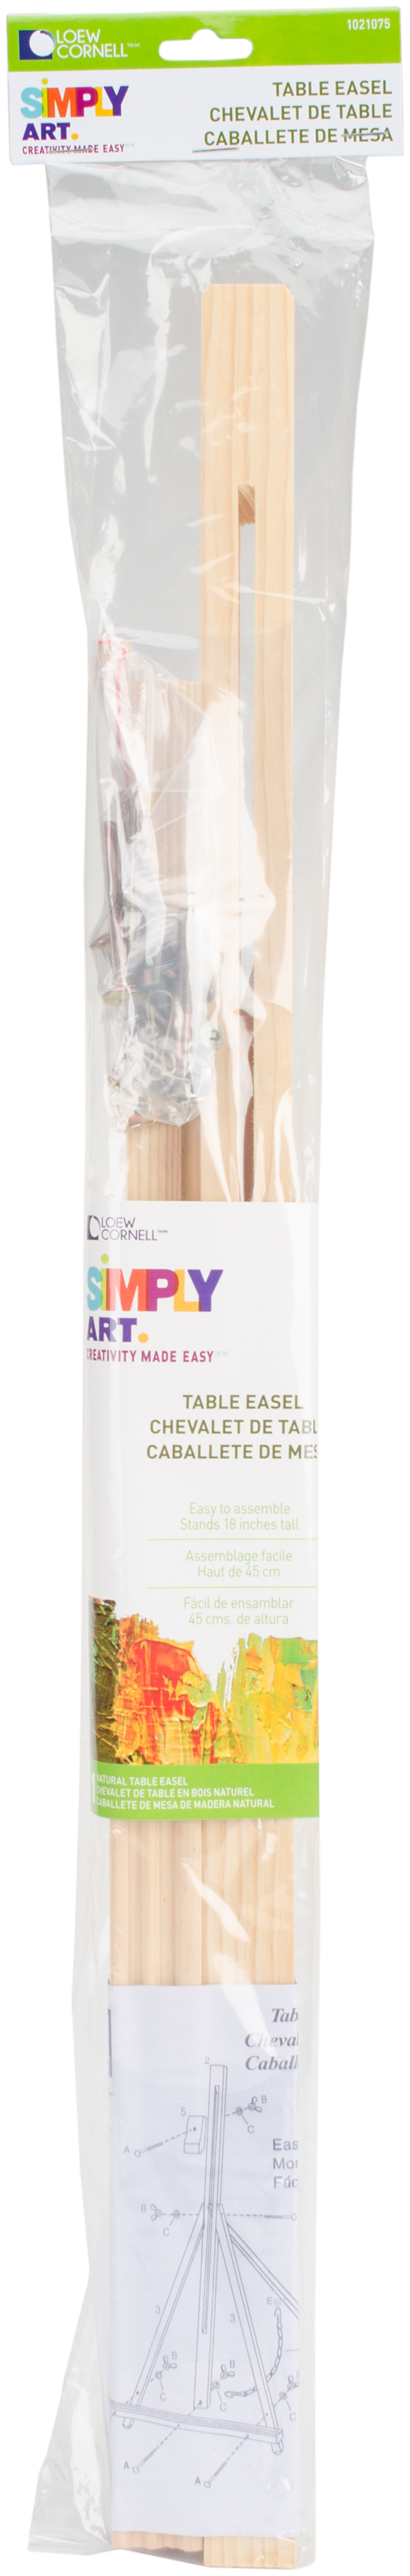 SIMPLY ART TABLE EASEL